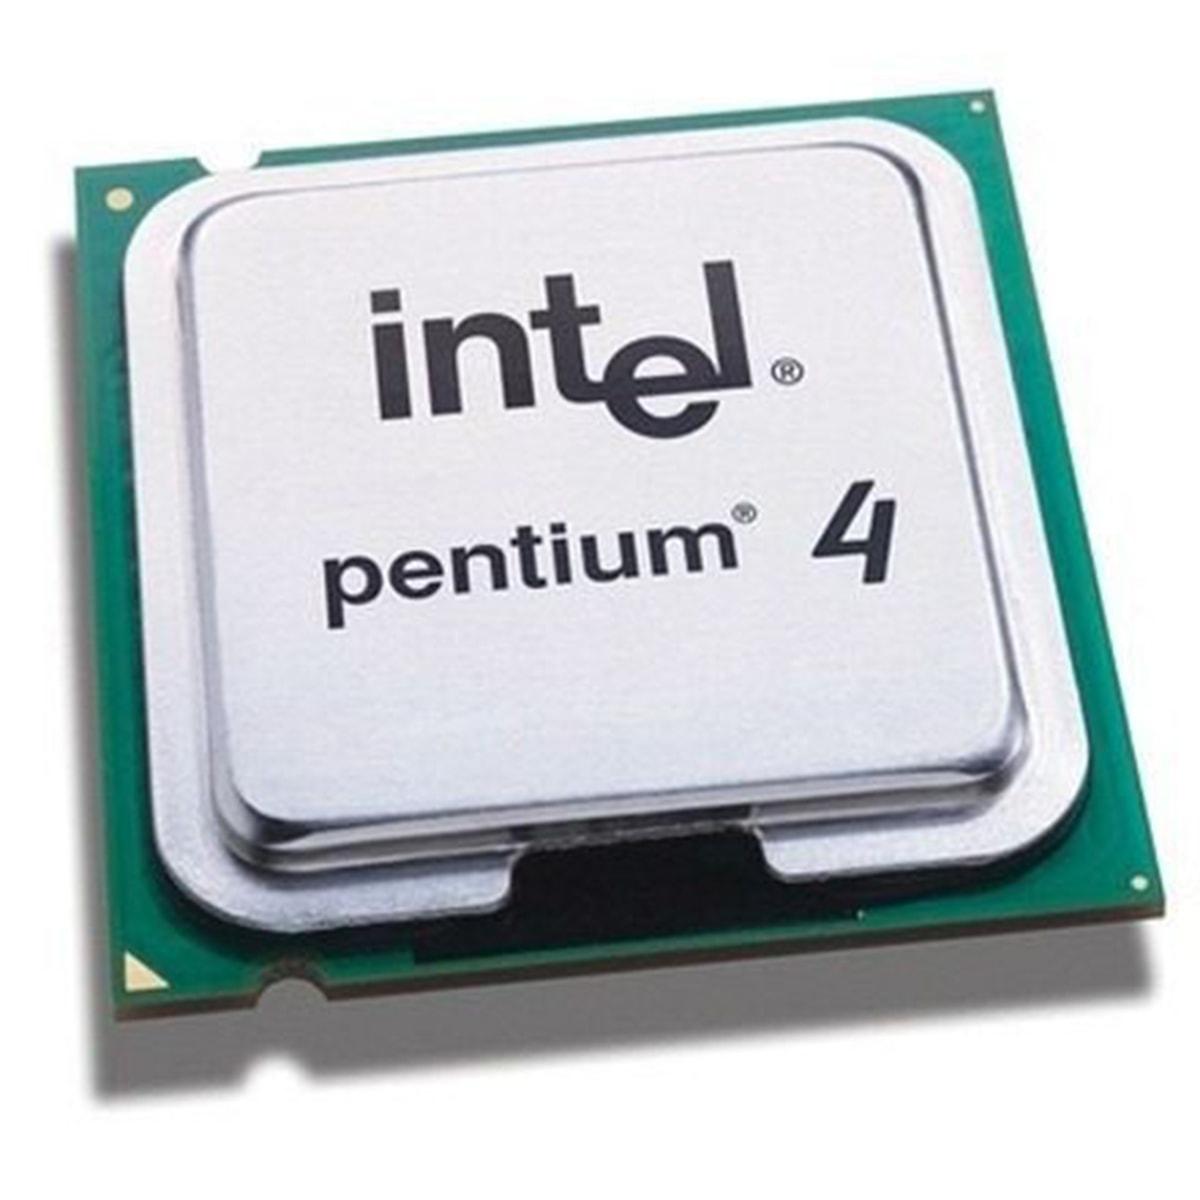 Processador Intel Pentium 4 HT 630 2M Cache / 3.00 GHz / 800 MHz / Socket 775- Seminovo